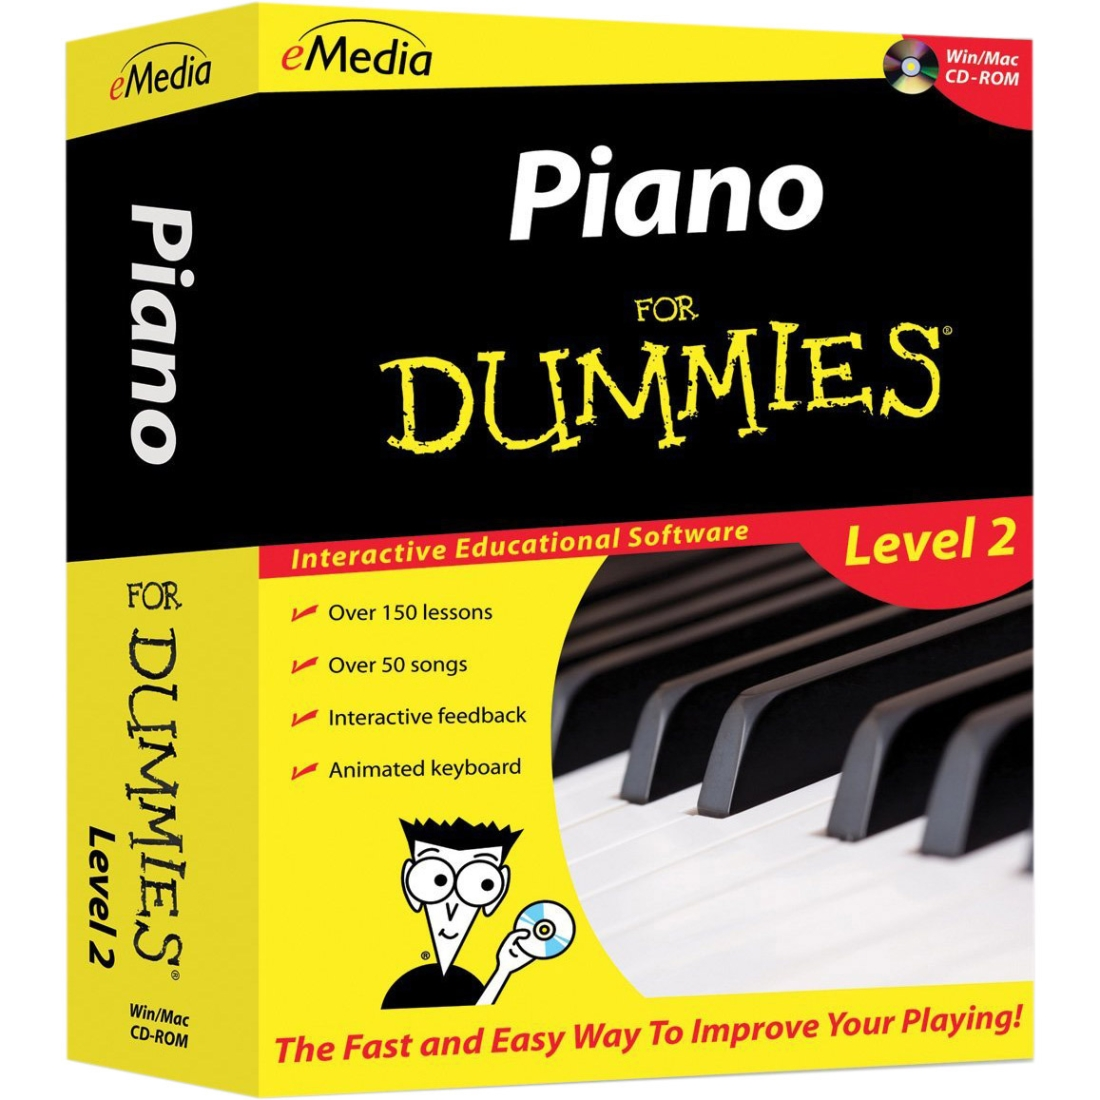 Emedia Music Piano For Dummies Level 2 - Music Training Course - Cd (fd09108) FD09108